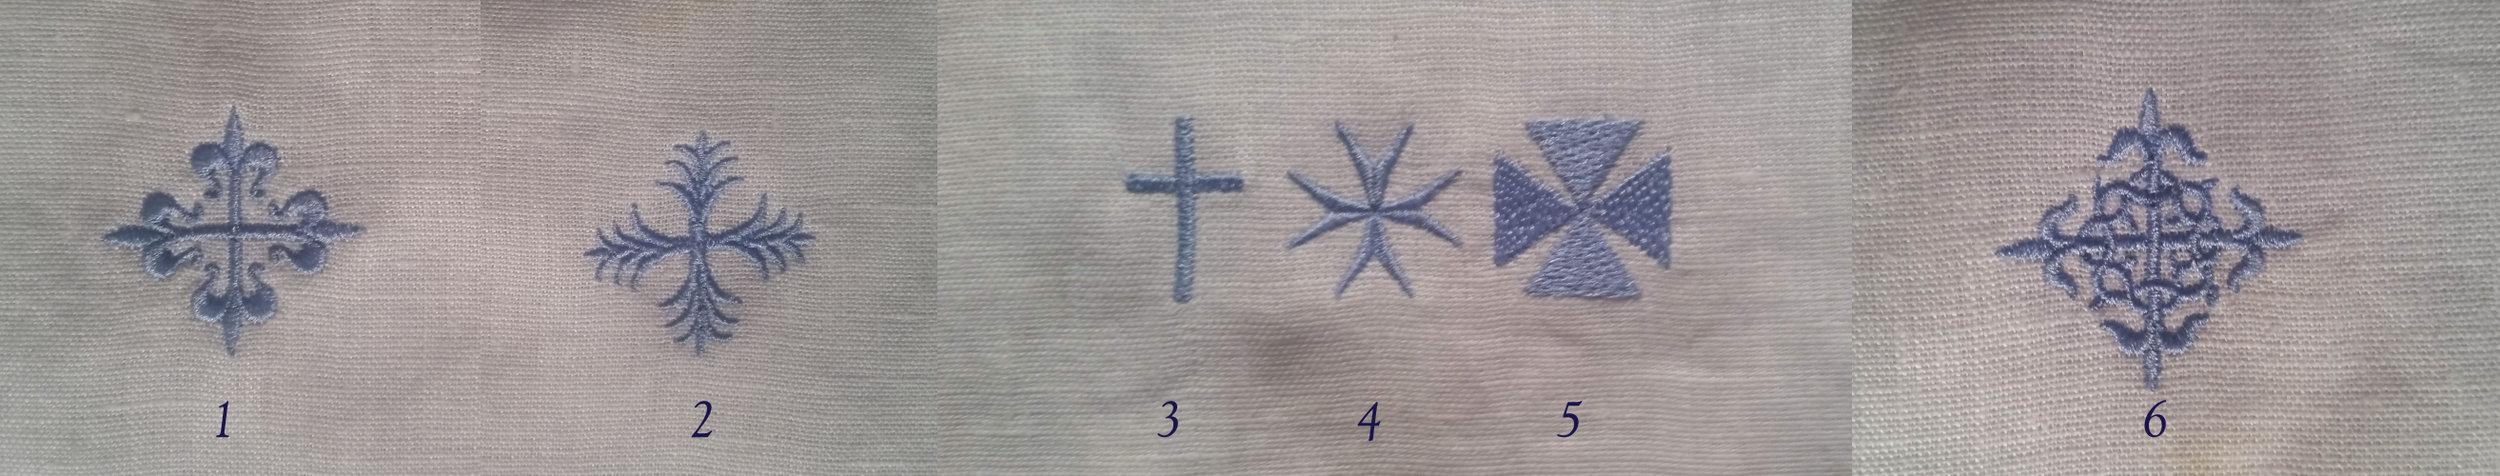 cross11.jpg